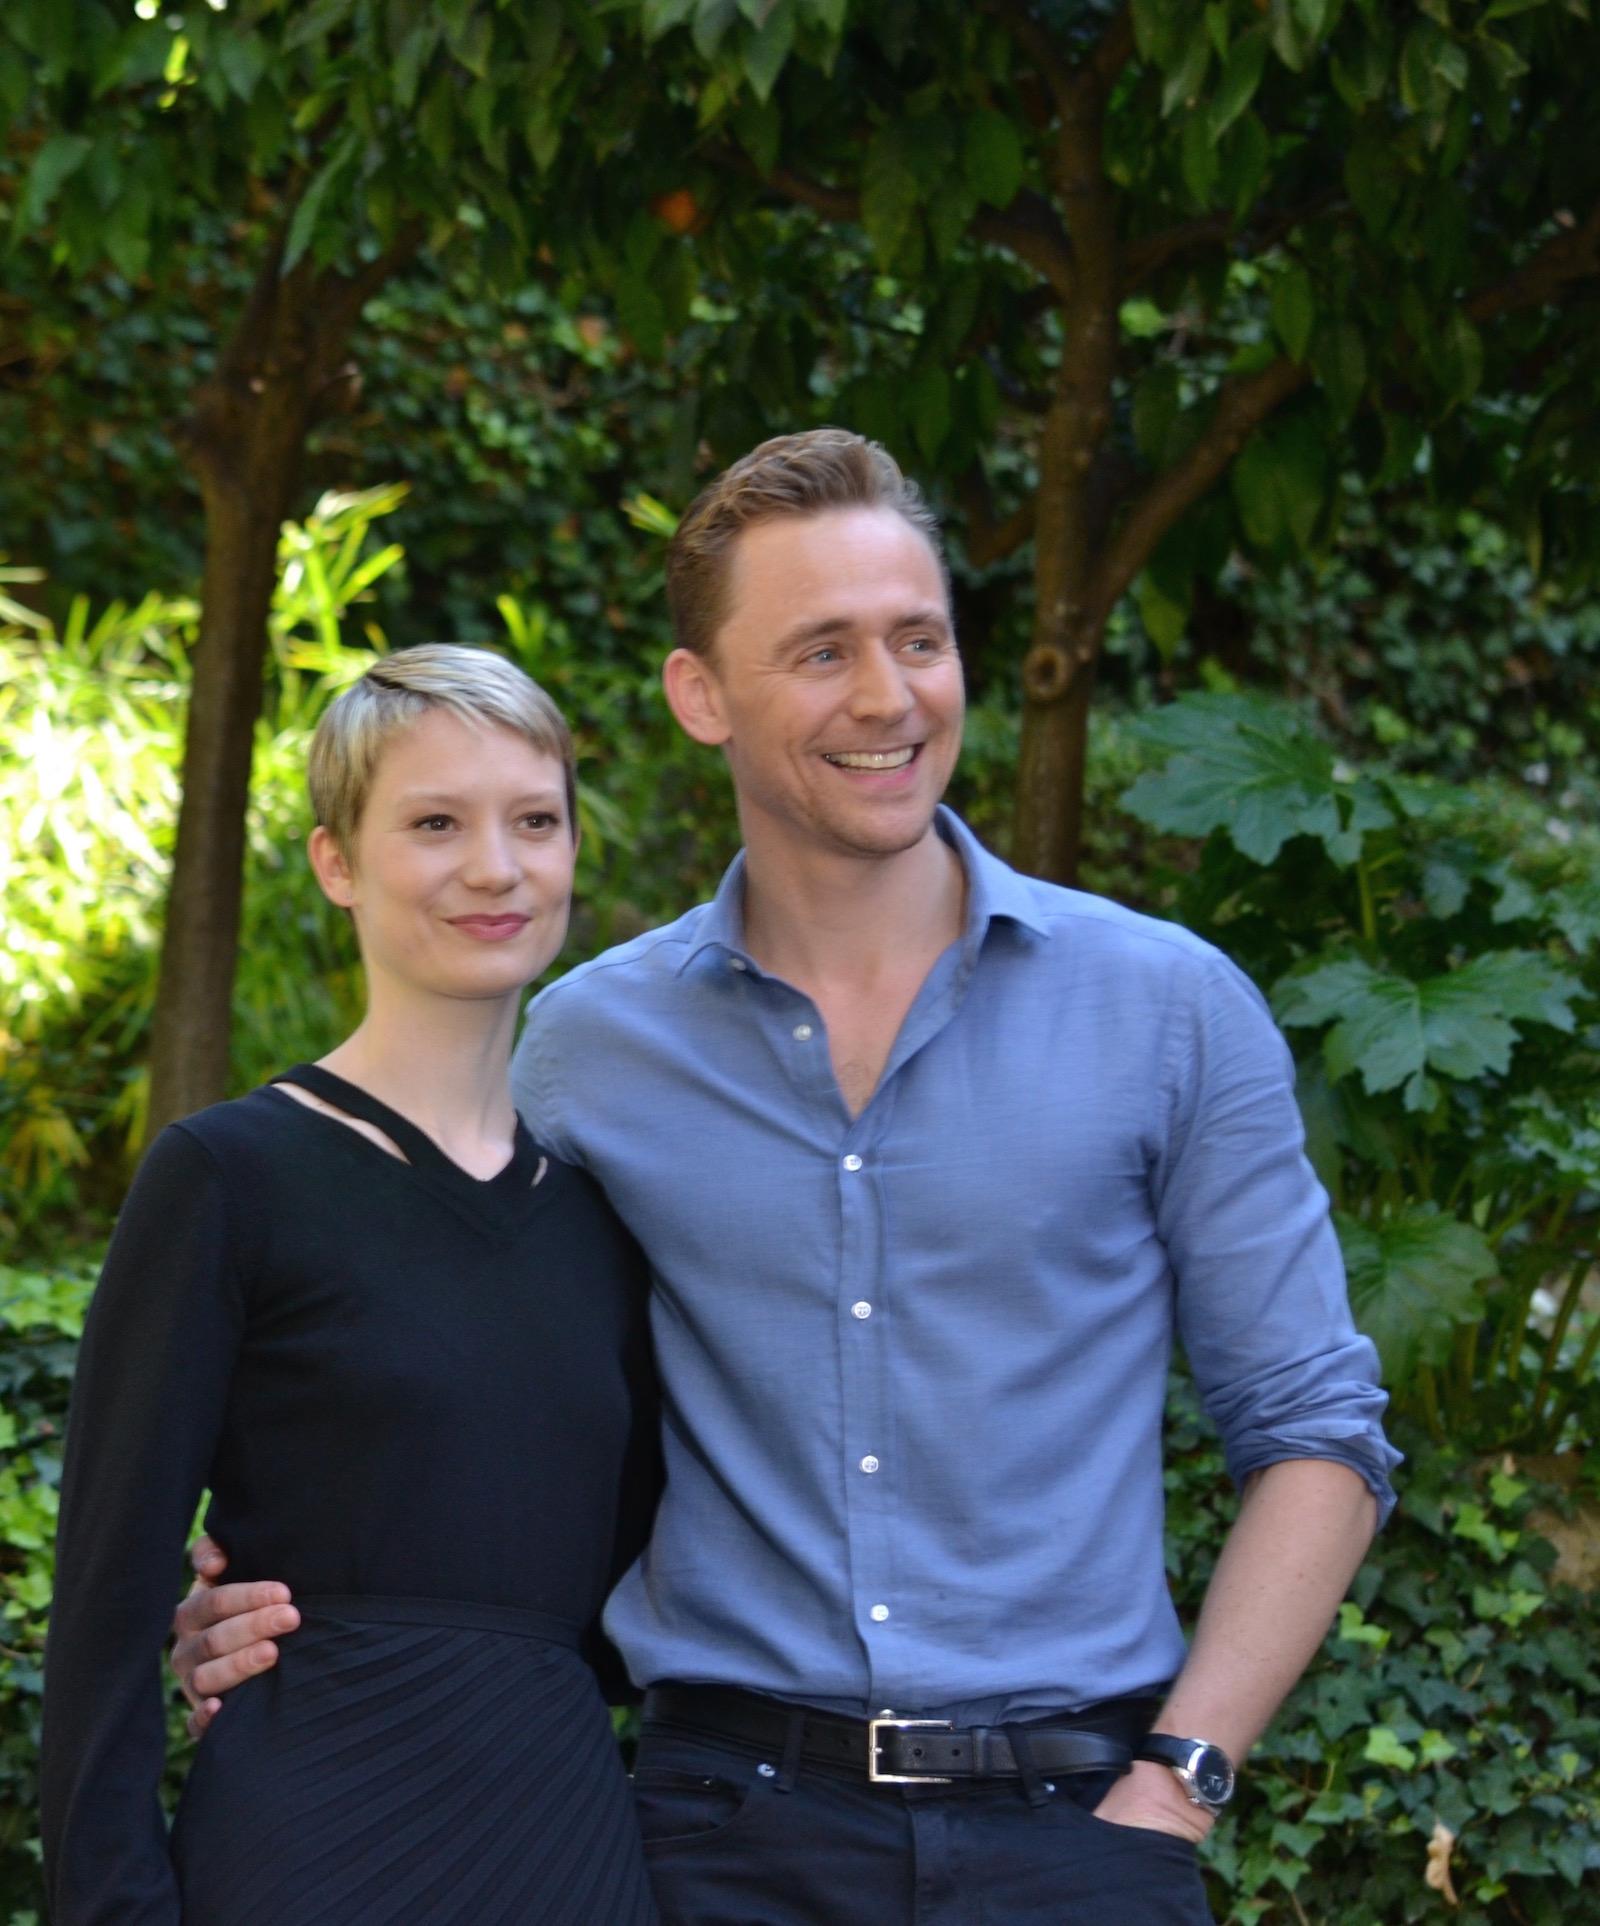 Crimson Peak: Mia Wasikowska e Tom Hiddleston posano per i fotografi al photocall